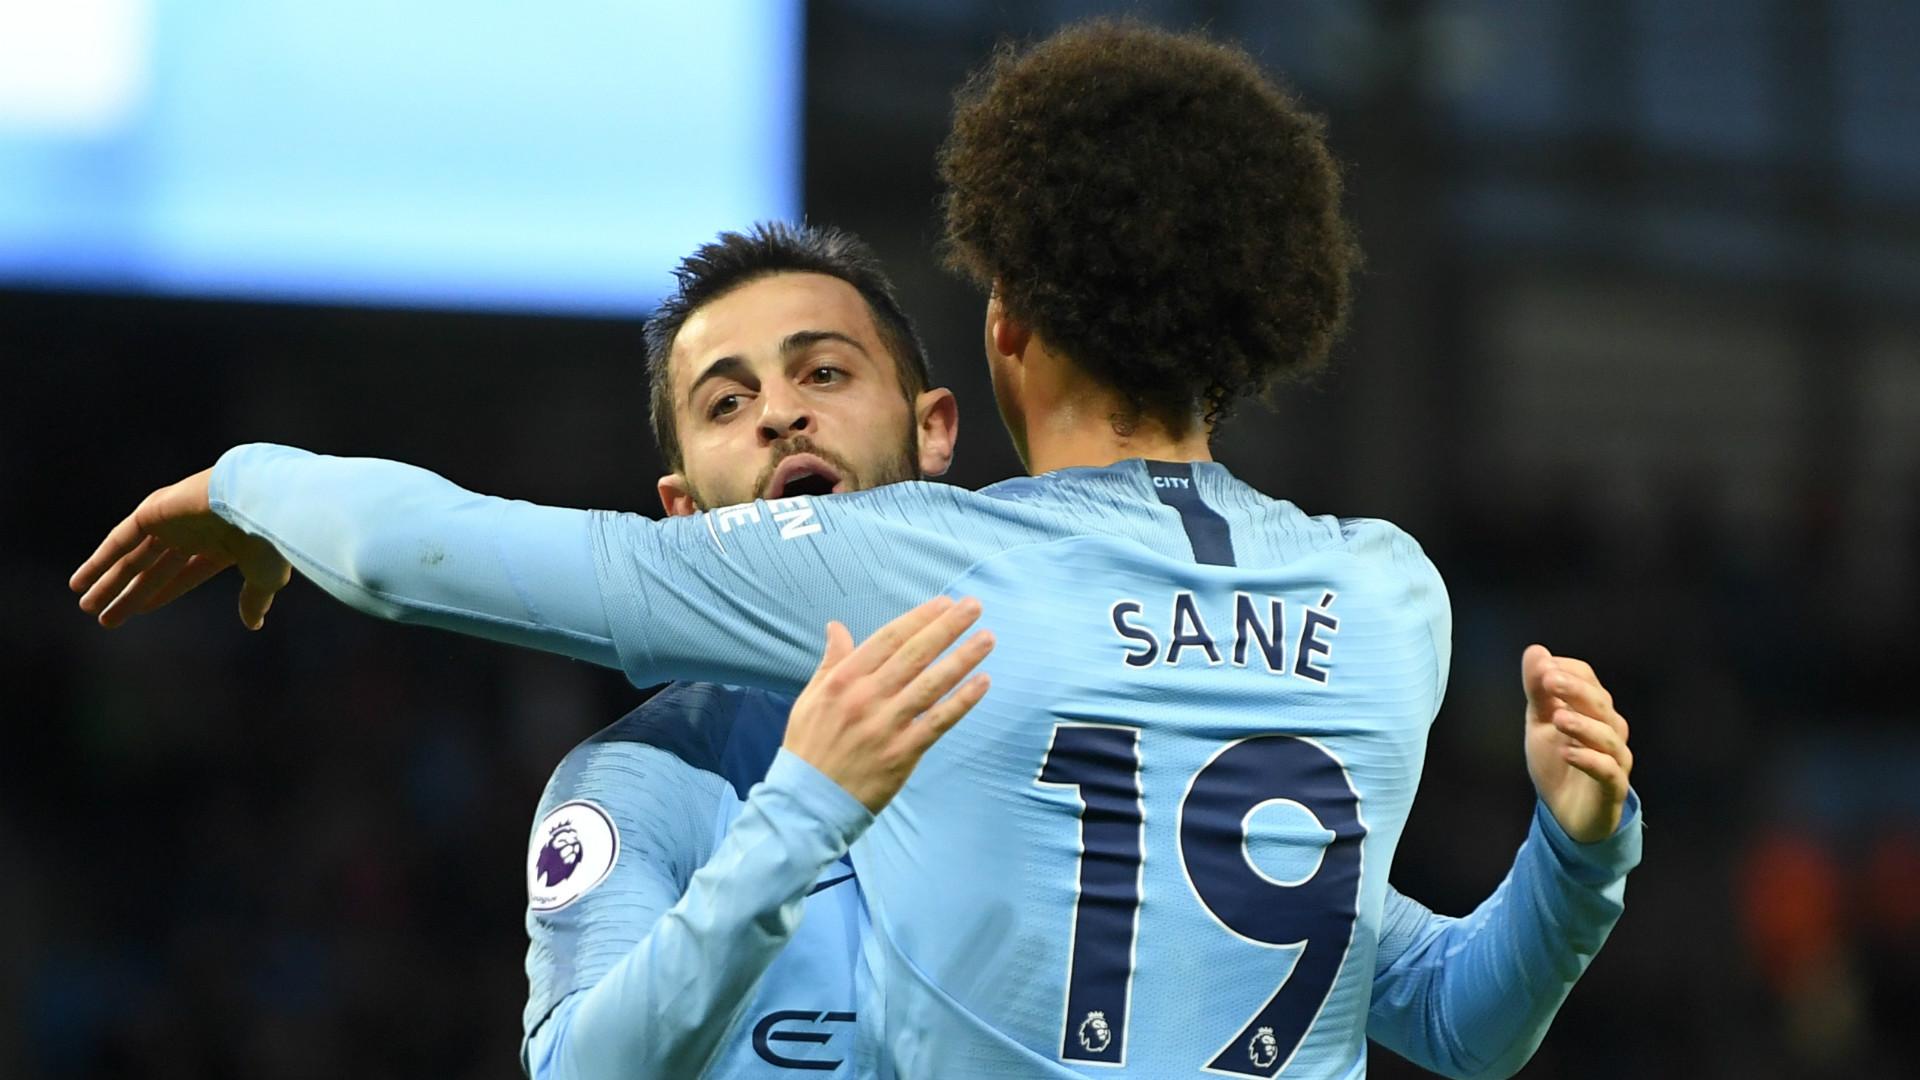 Bernardo Silva Leroy Sane Manchester City 2017-18